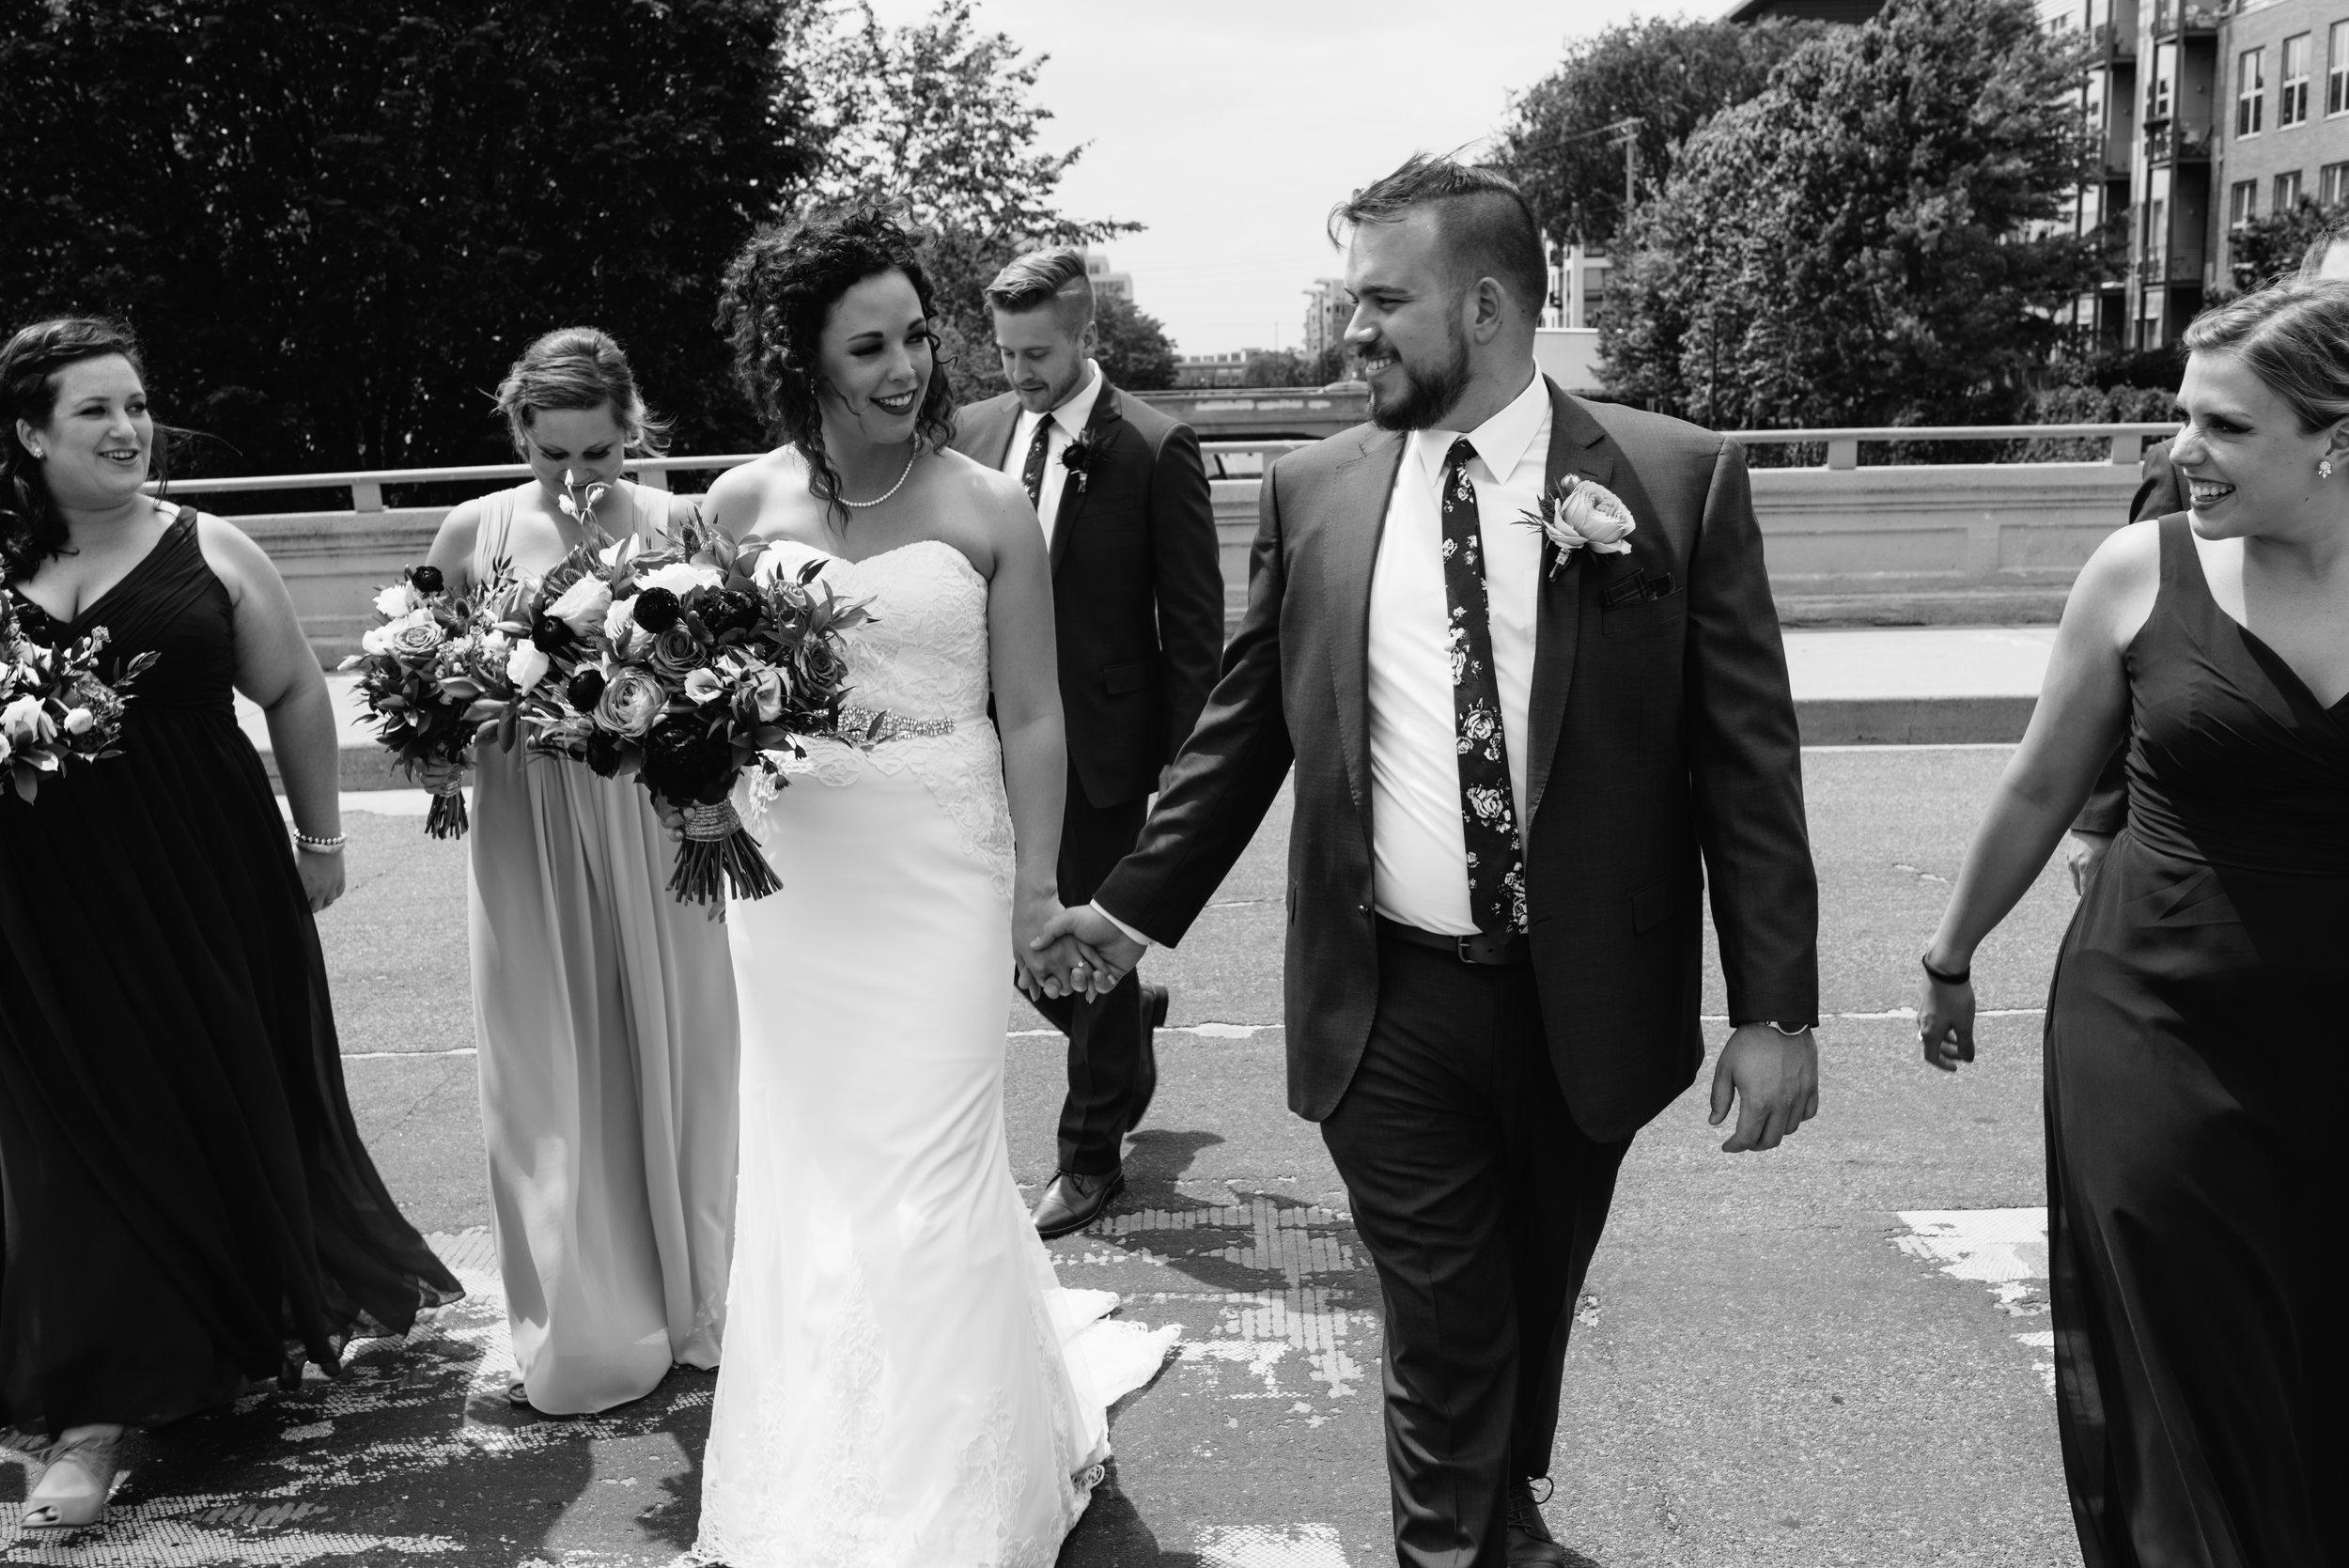 industrial-wedding-minneapolis-photographer-1-11.jpg